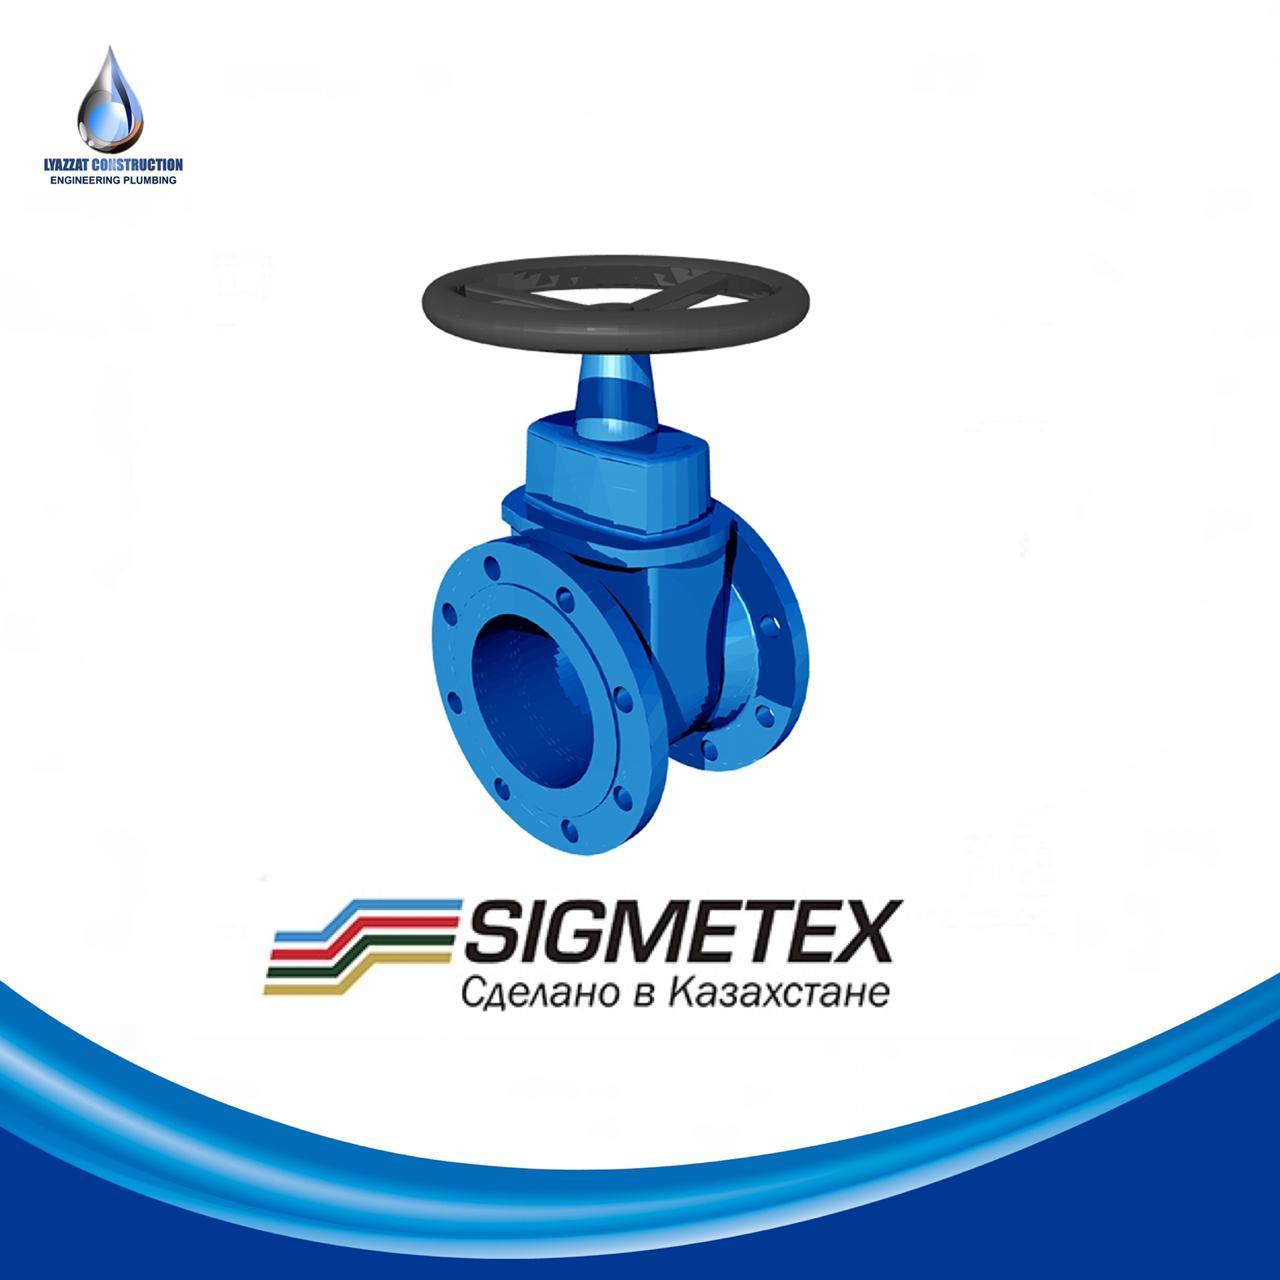 Задвижка Sigmetex DN 600 (Сигметэкс)